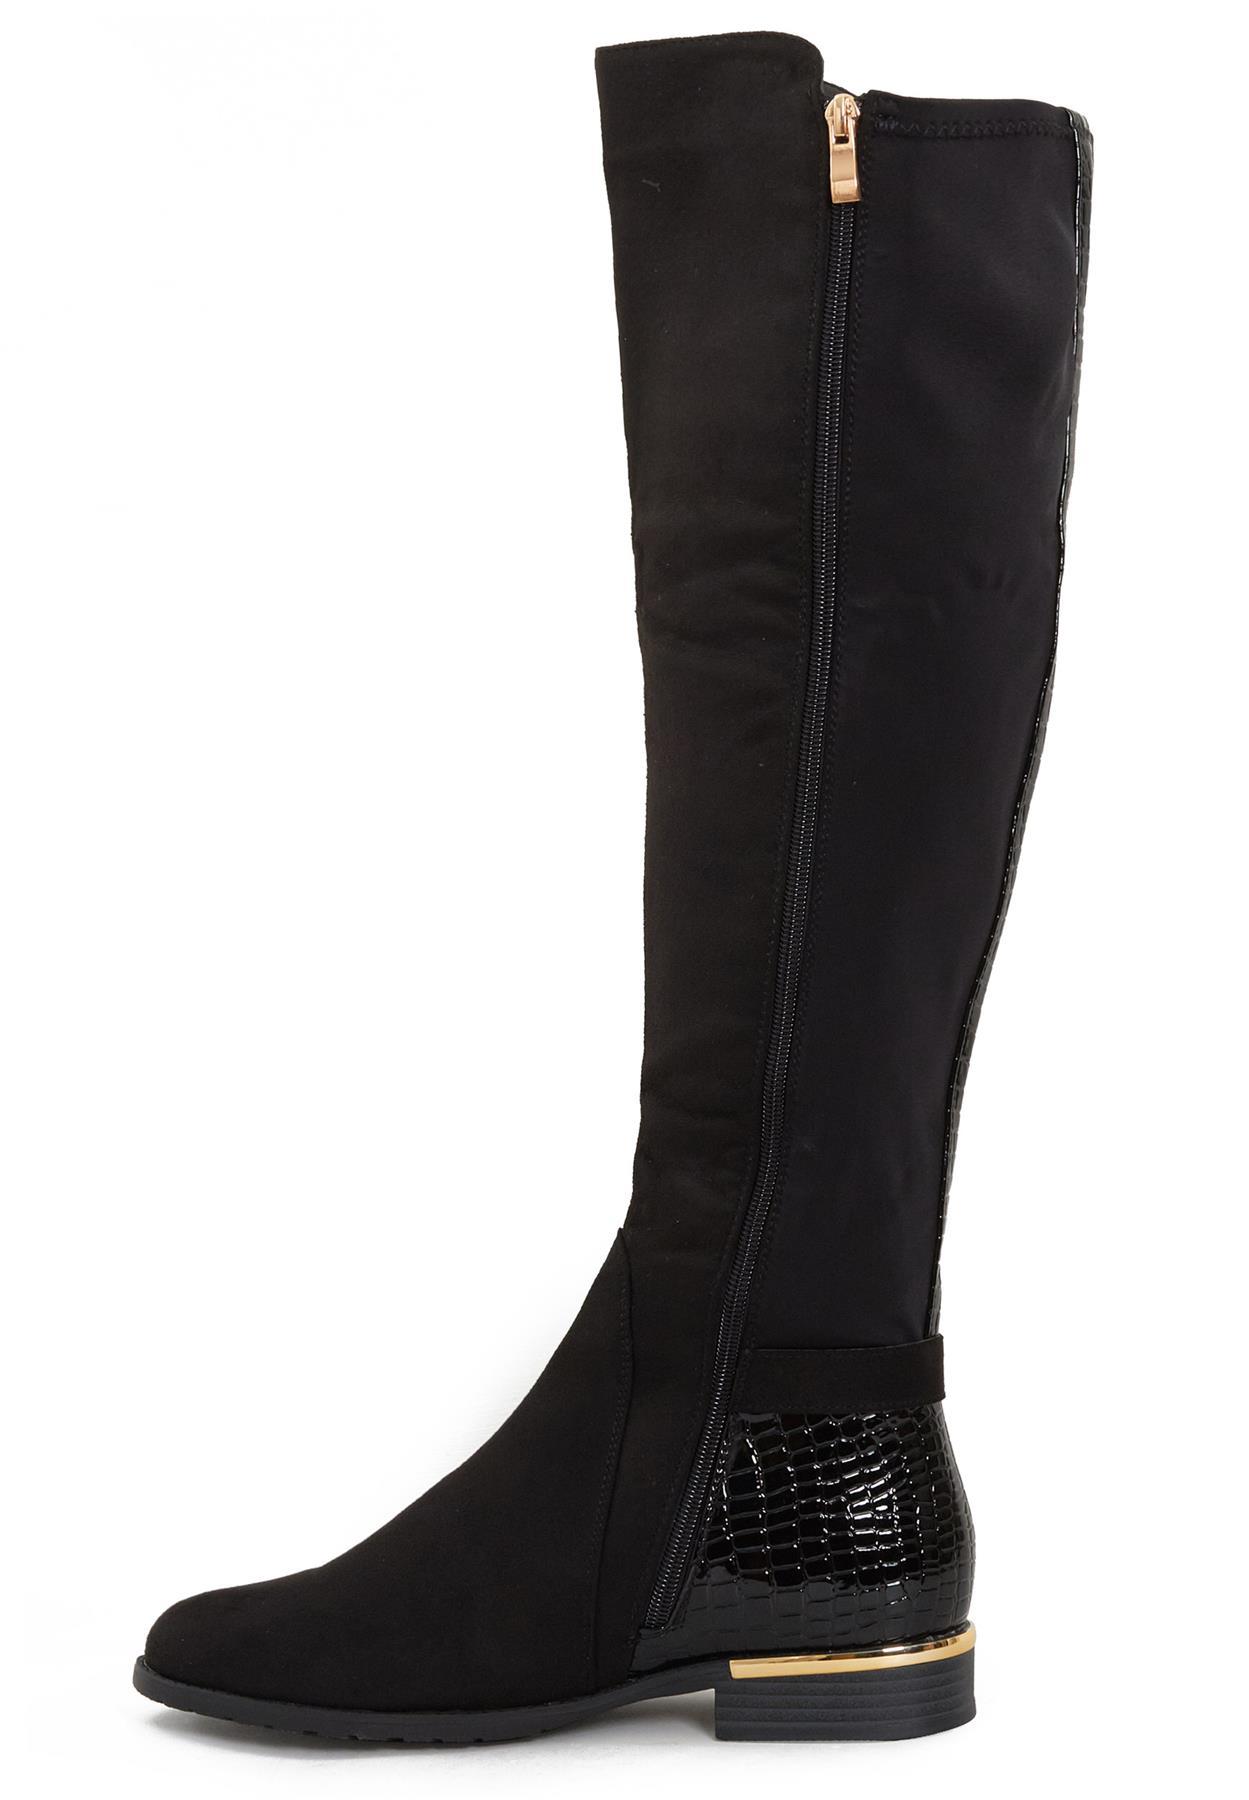 Womens-Ladies-Knee-High-Gold-Detail-Low-Block-Heel-Zip-Up-PU-Suede-Black-Boots thumbnail 10